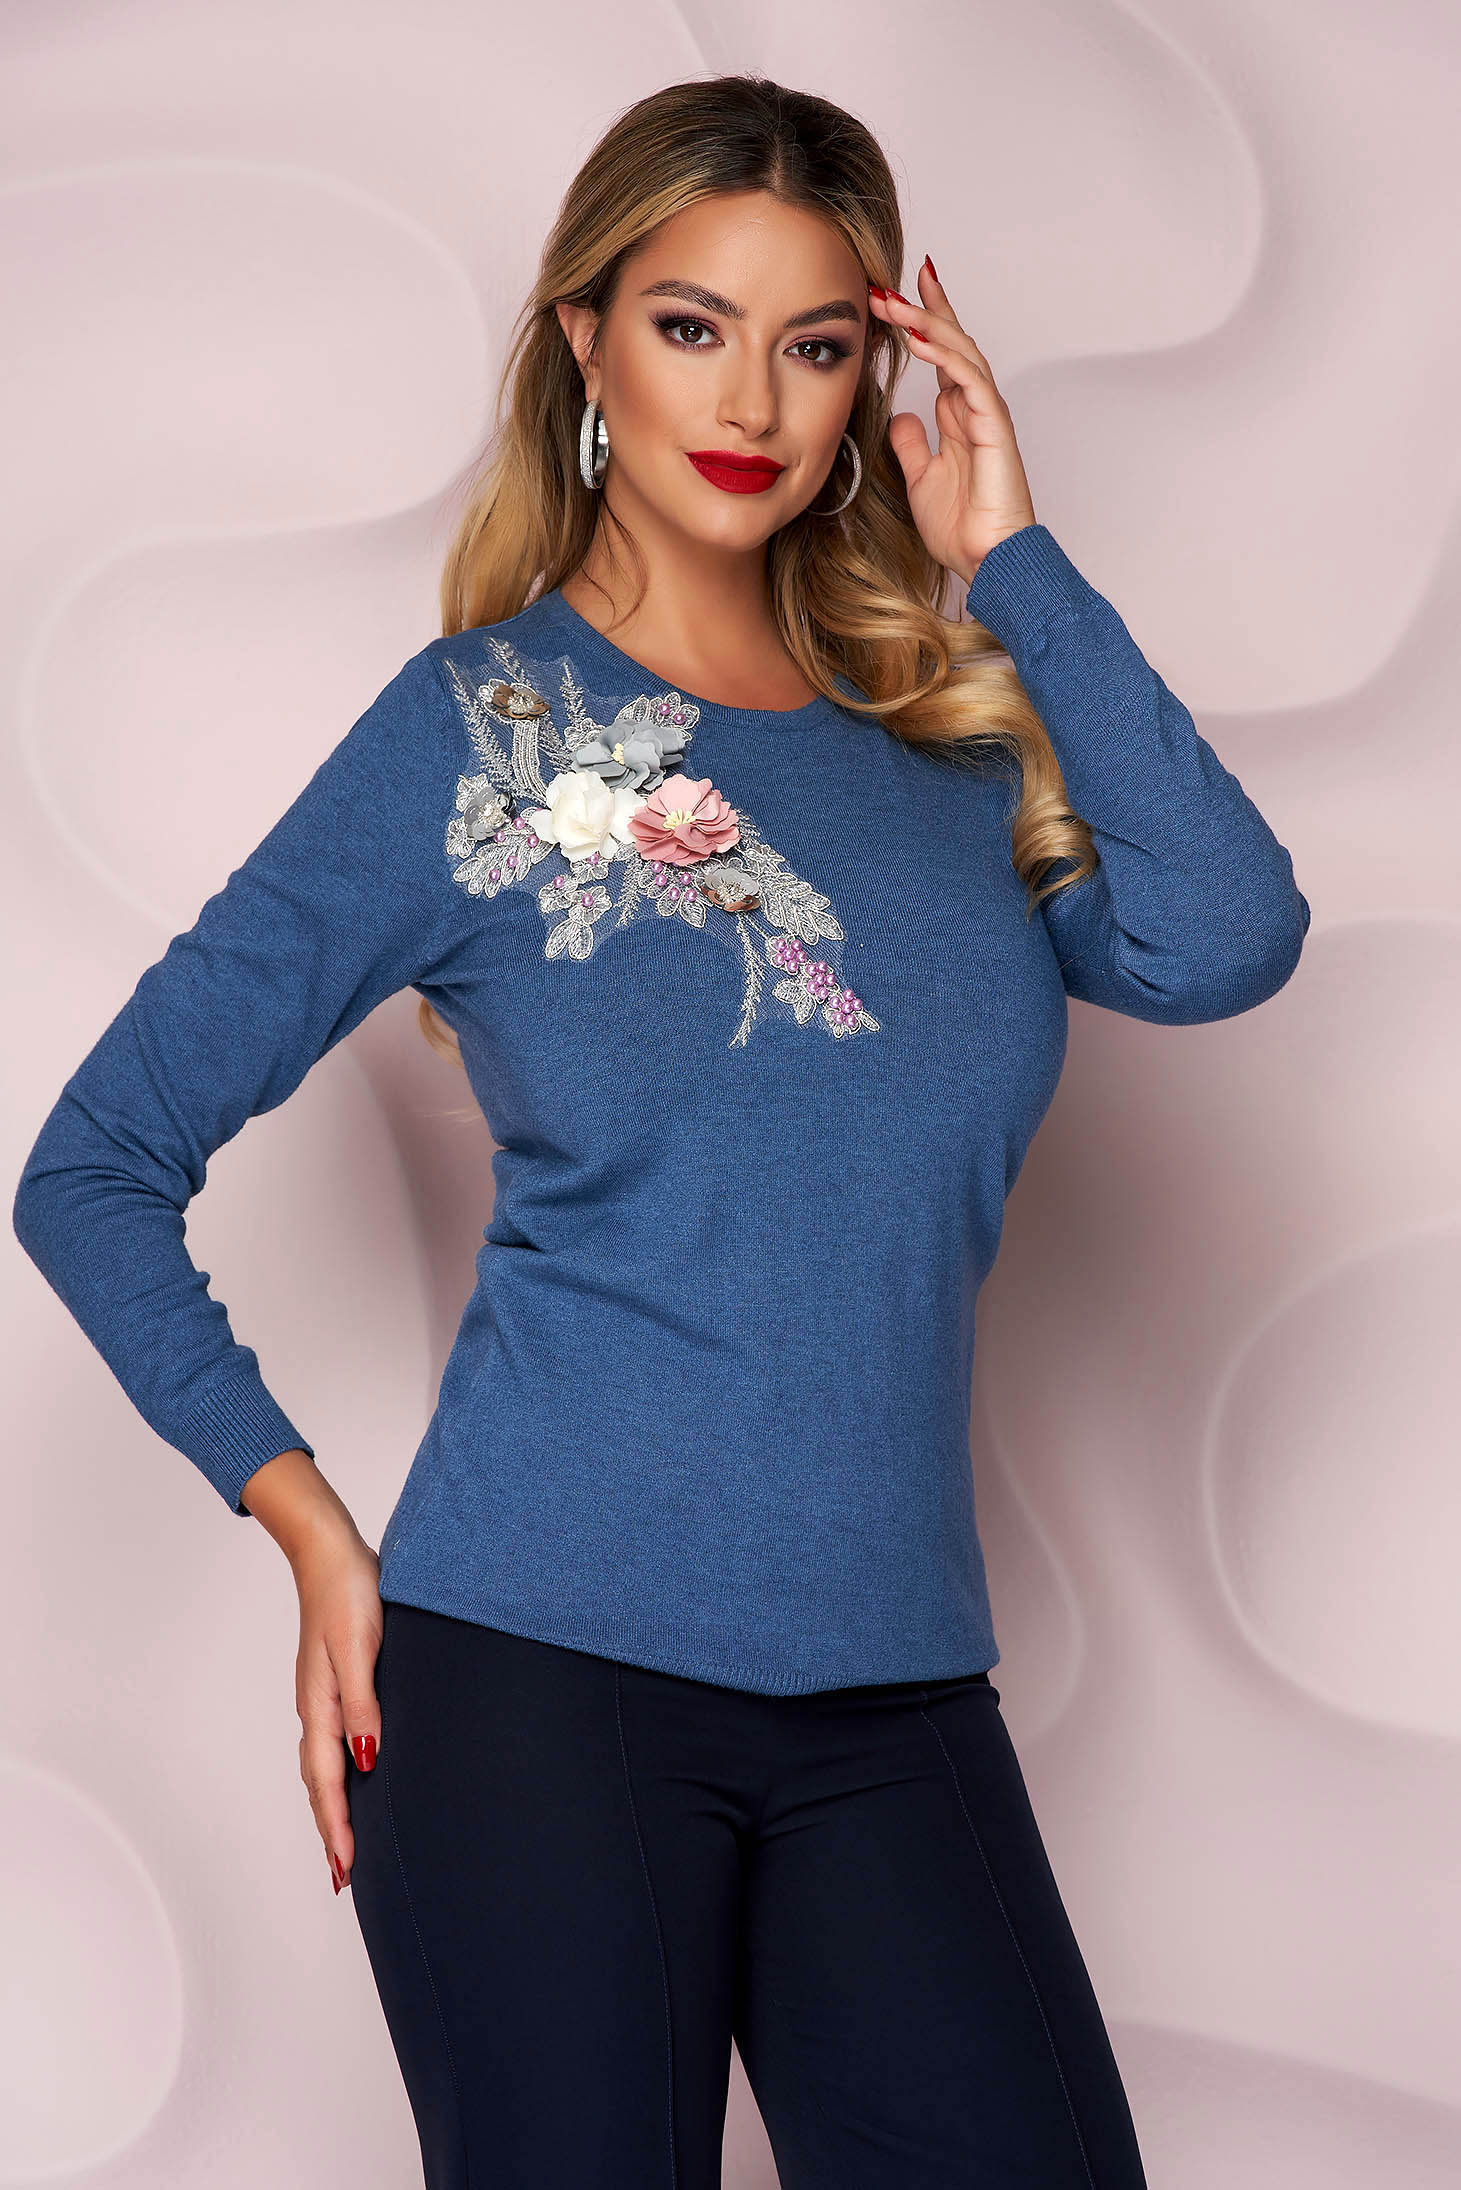 Pulover Lady Pandora albastru tricotat cu croi larg cu flori in relief cu efect 3d